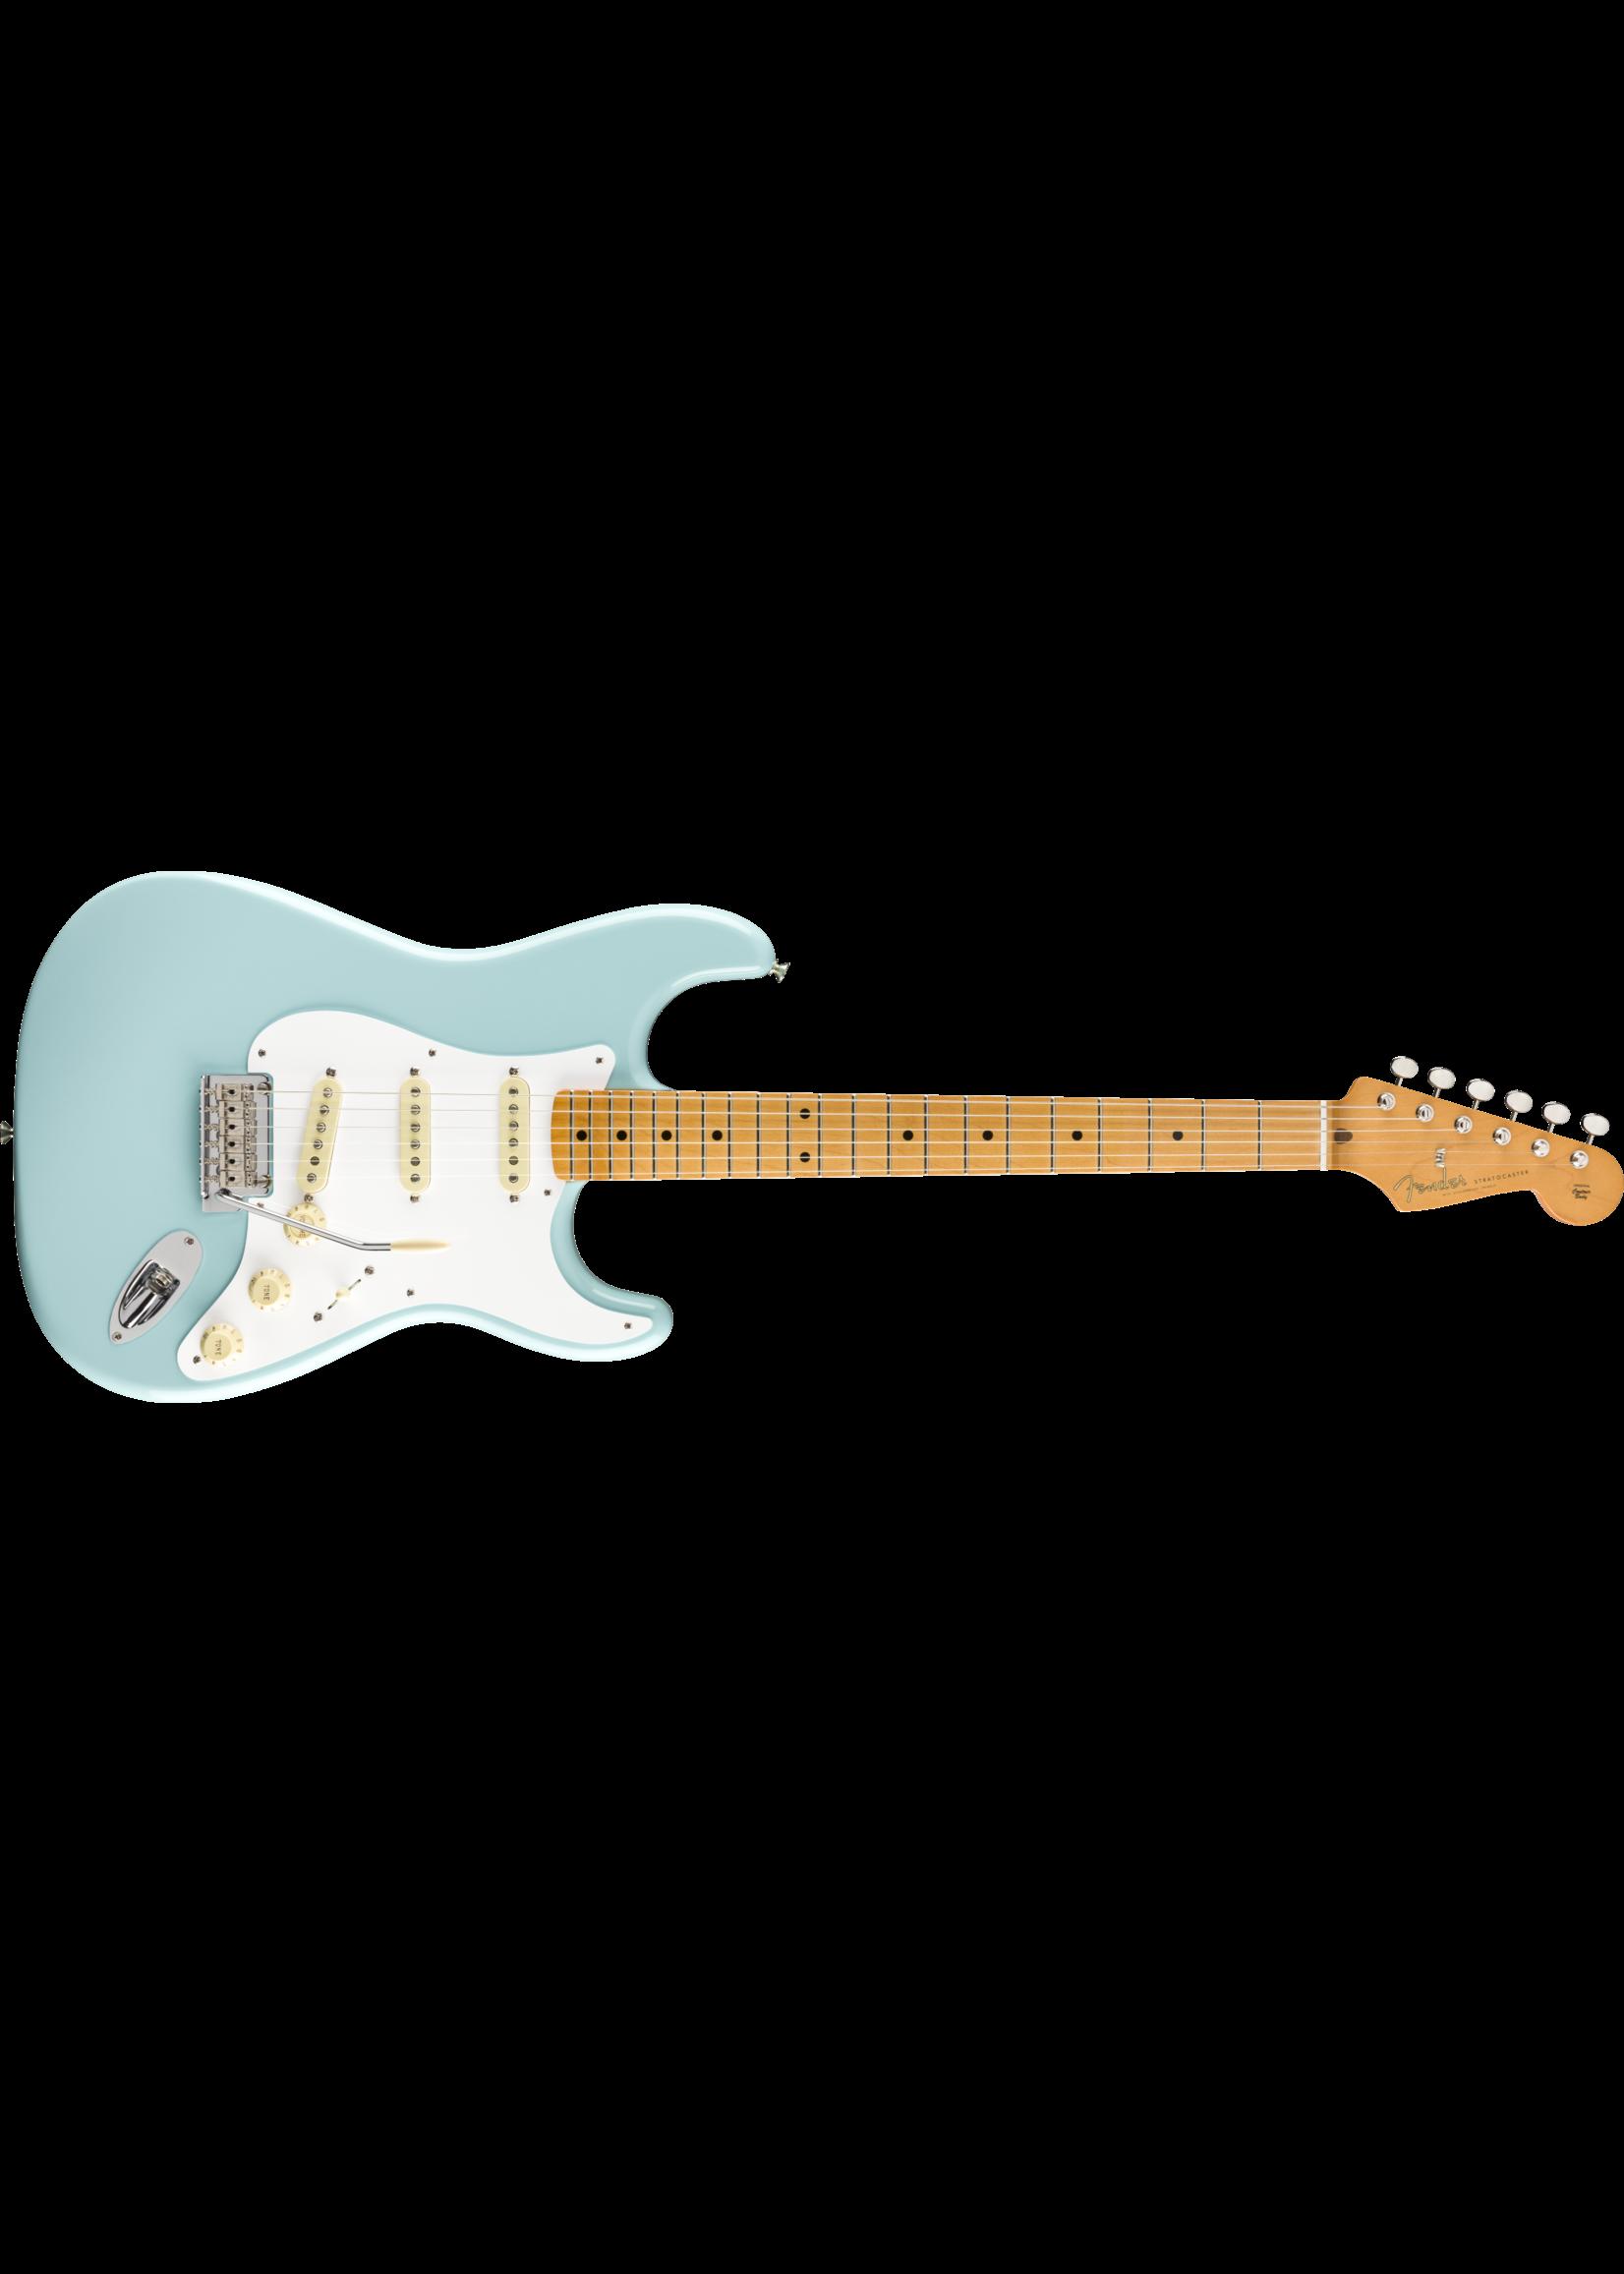 Fender Fender Vintera '50s Stratocaster Modified with Maple Fretboard Daphne Blue